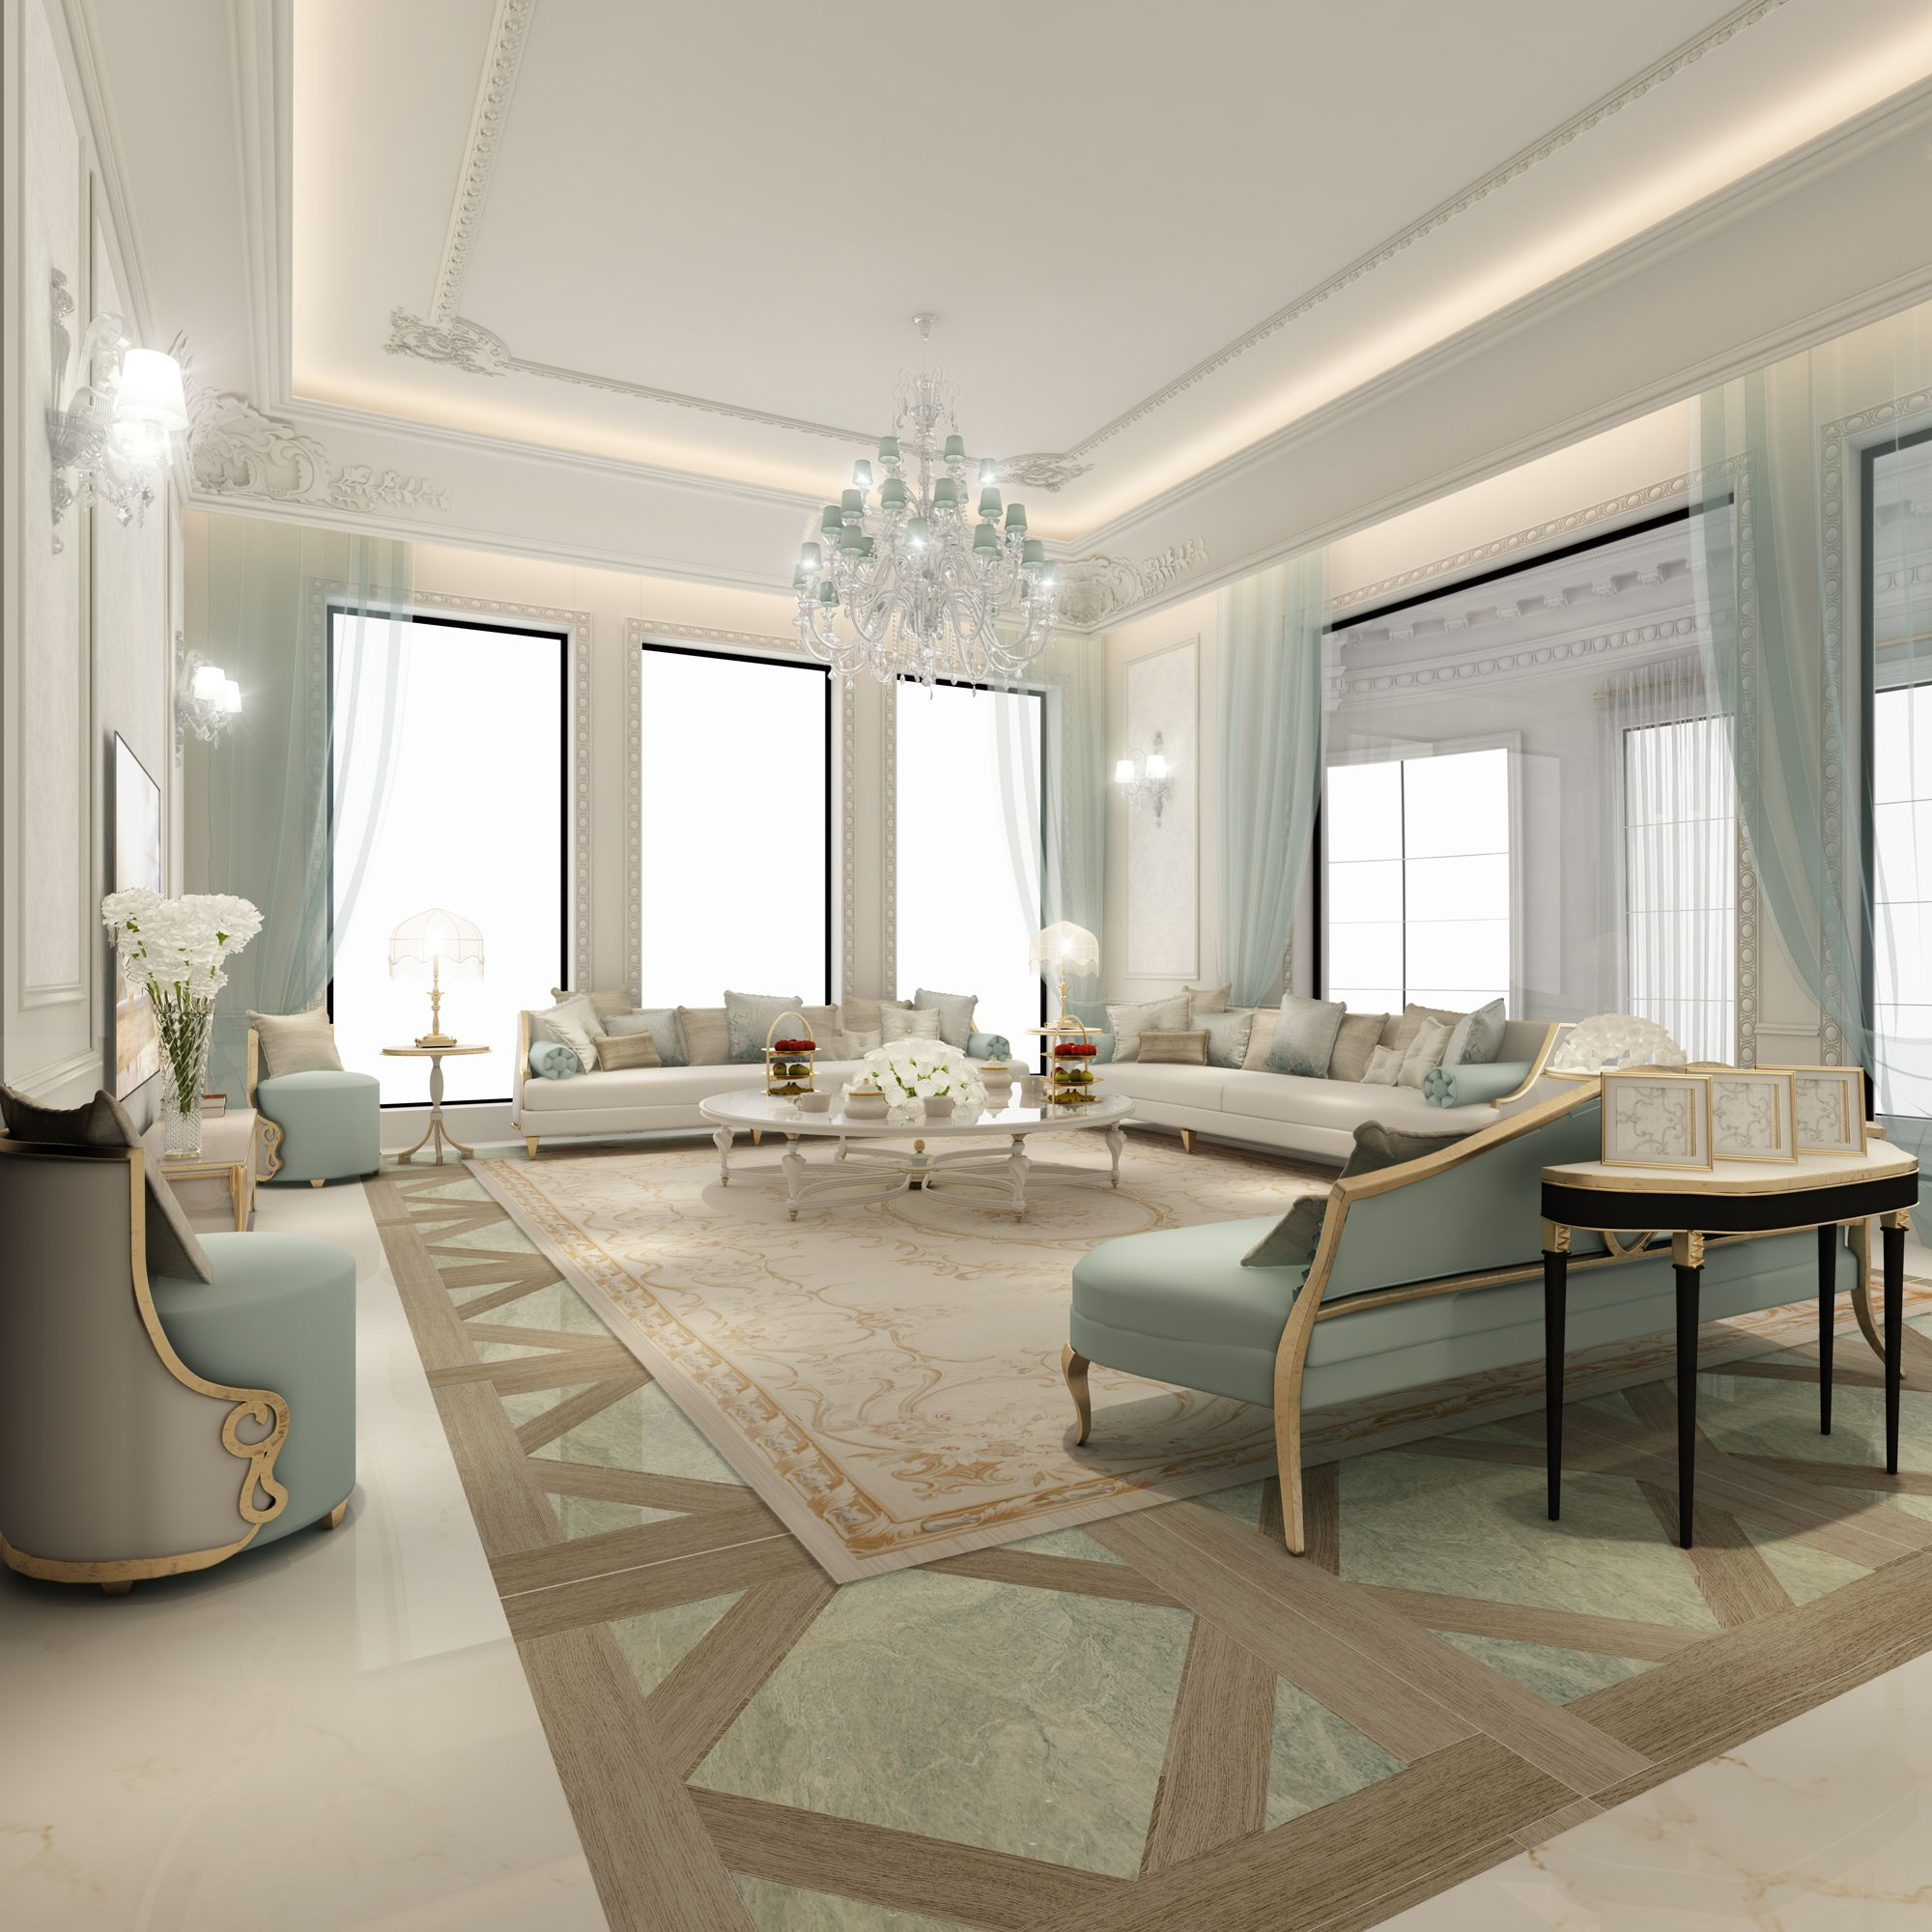 Modern Glam Living Room Decorating Ideas 19: Family-sitting-are-design-dubai